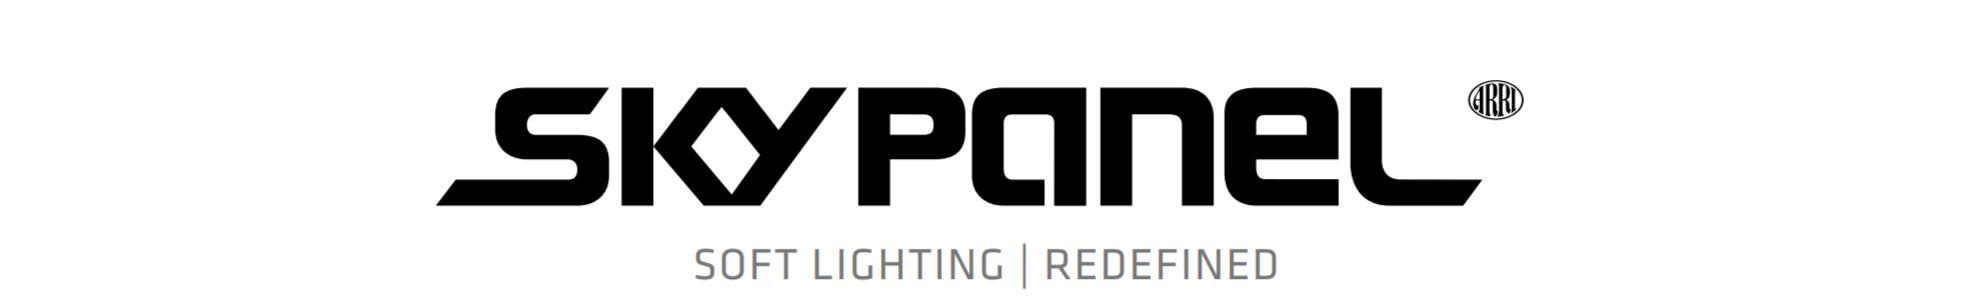 ARRI SkyPanel | JR Lighting and Grip Las Vegas